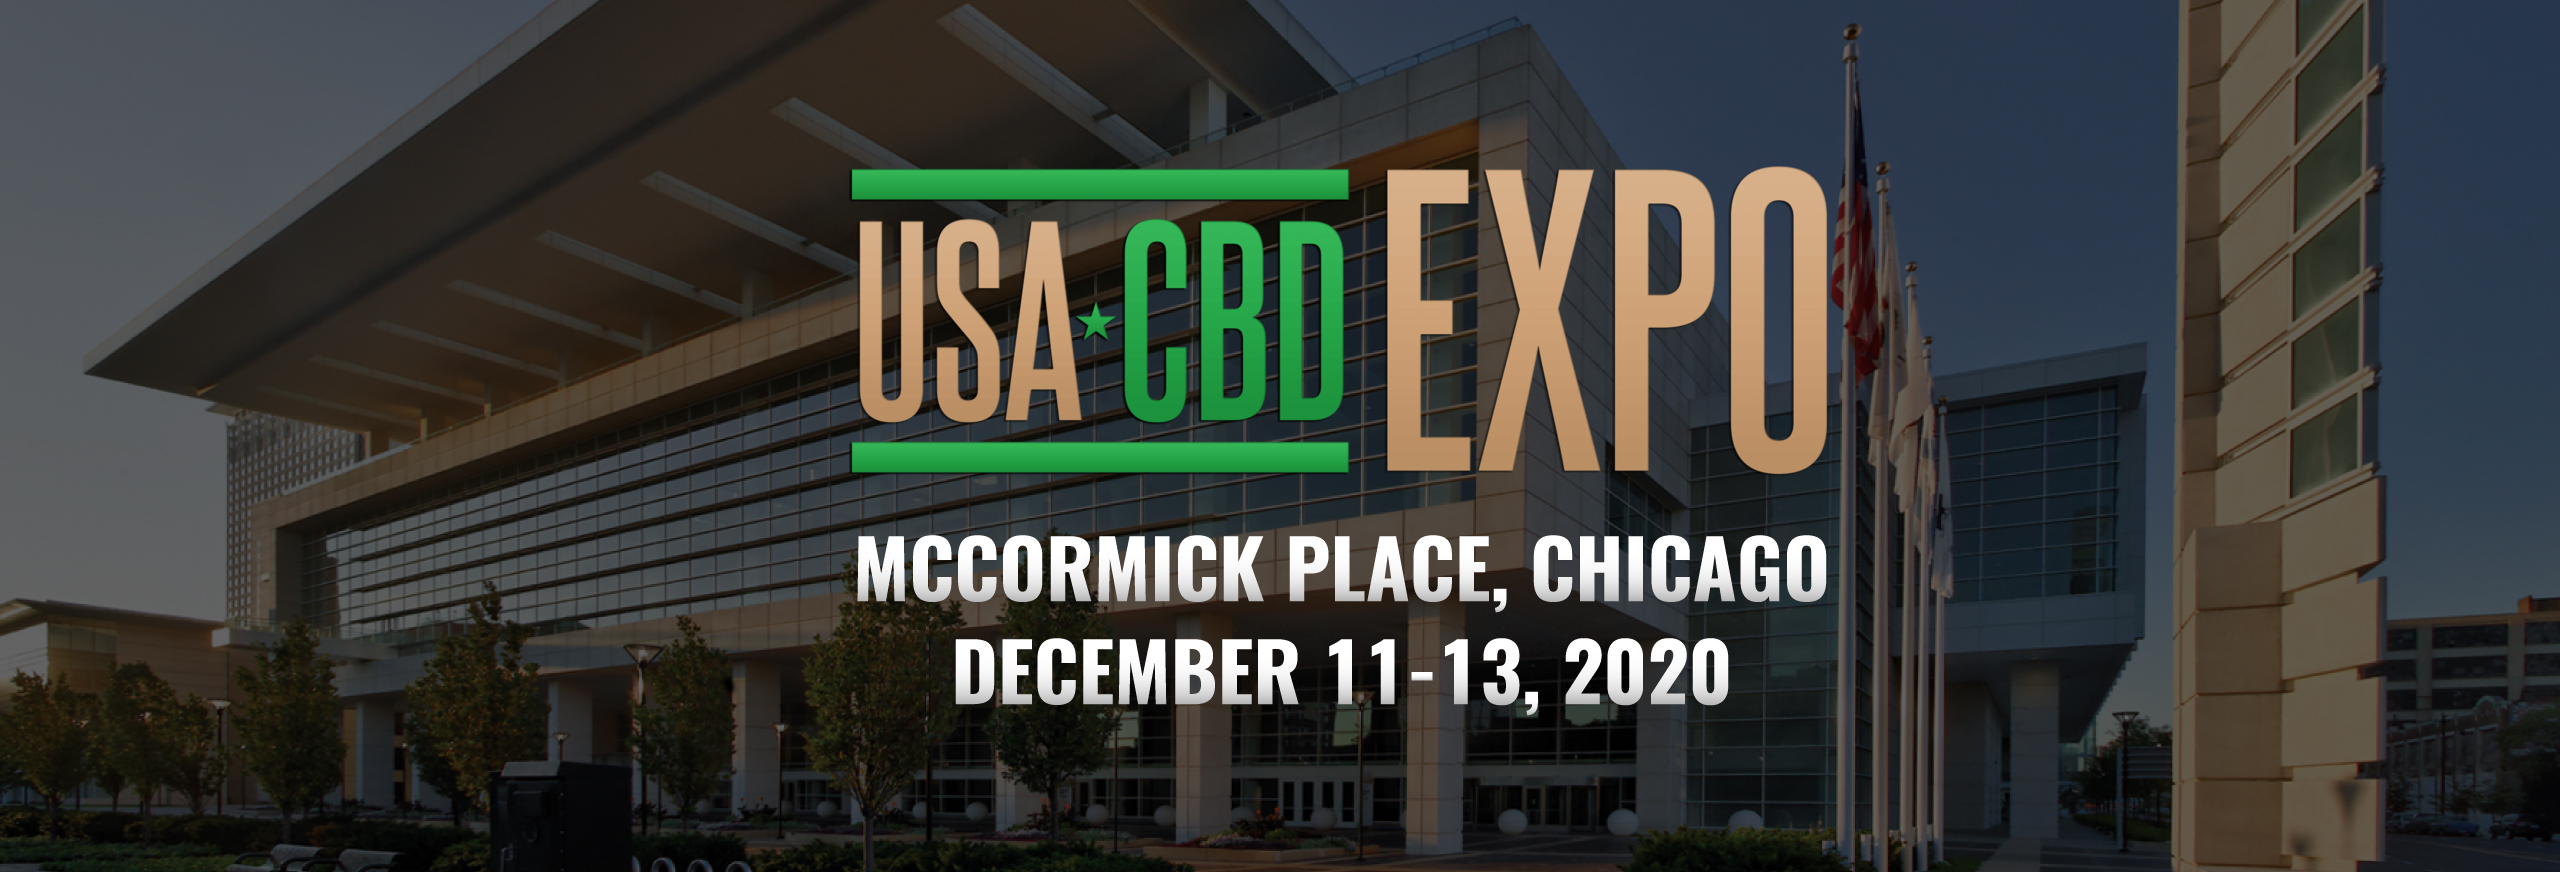 advertising banner for USA CBA EXPO Chicago 2020